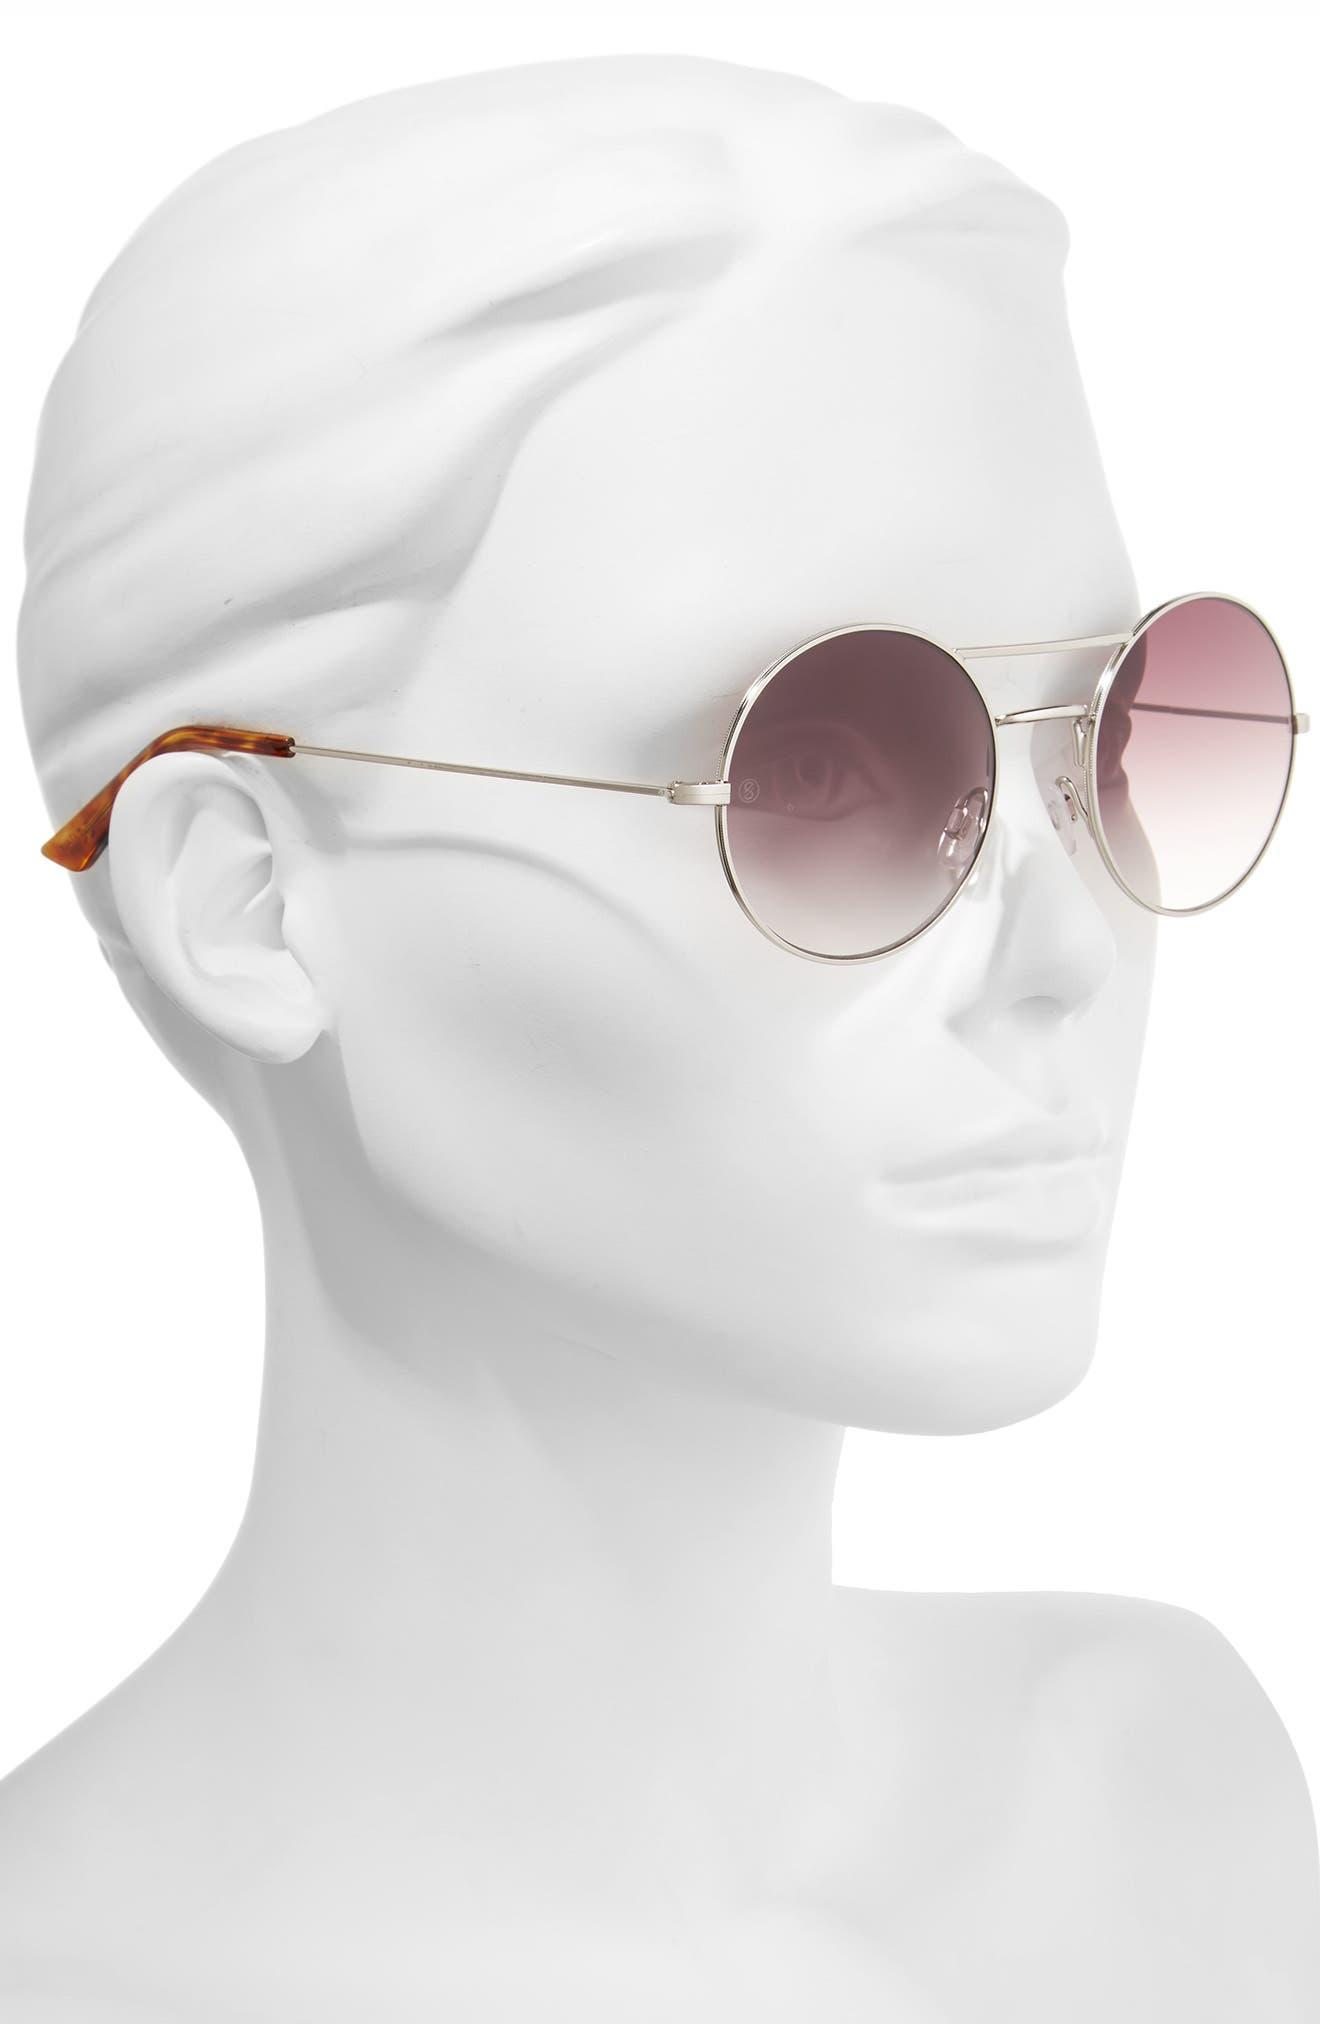 D'BLANC The End 52mm Gradient Round Sunglasses,                             Alternate thumbnail 2, color,                             040